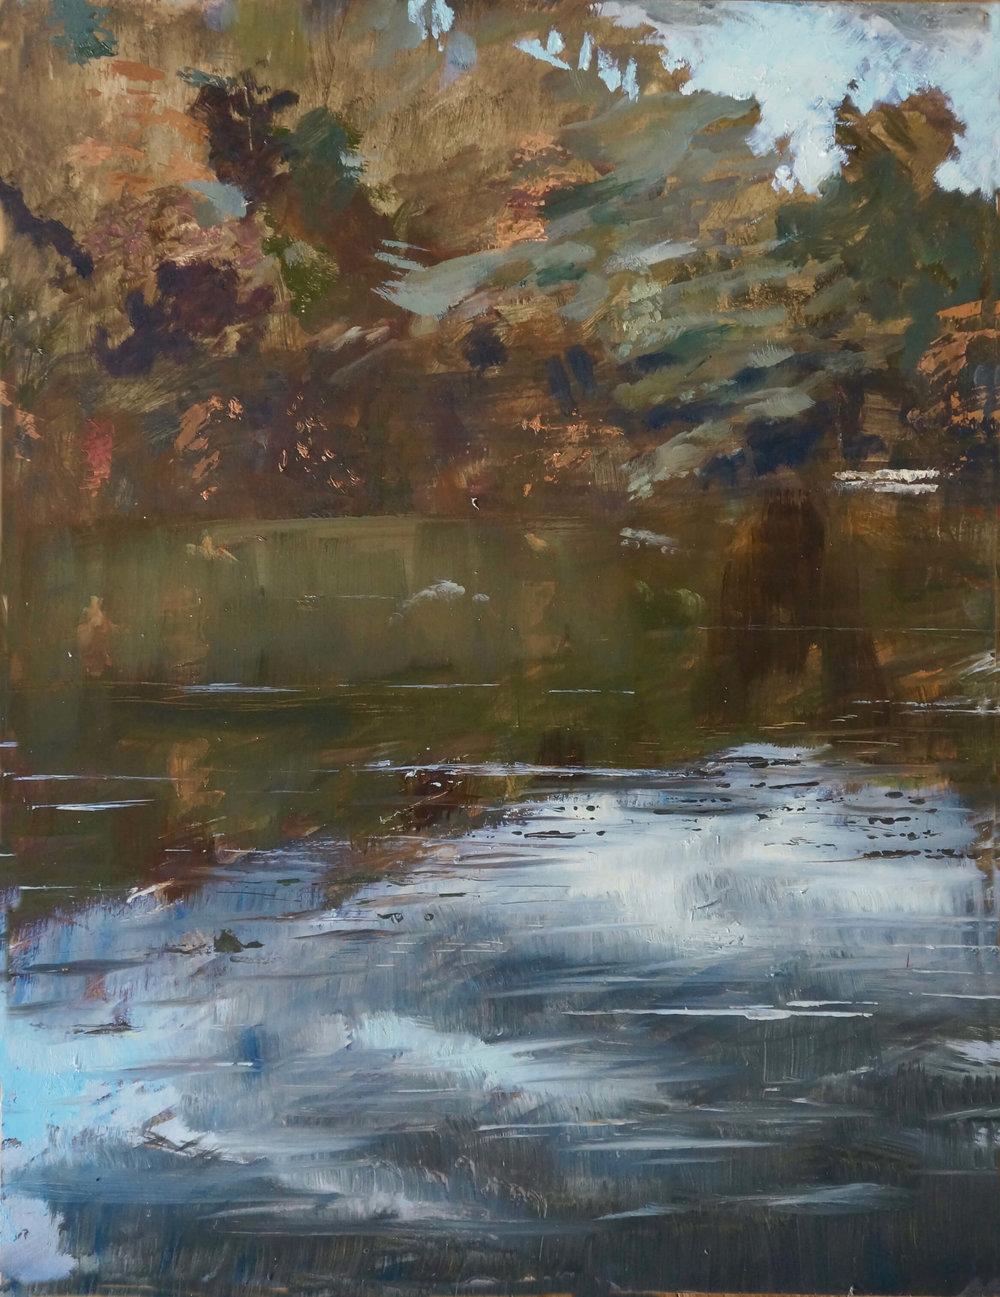 RHSK034 Matsubarako Lake Autumn Stillness ( Oil on Linen ) 59.5 x 45.5 cm